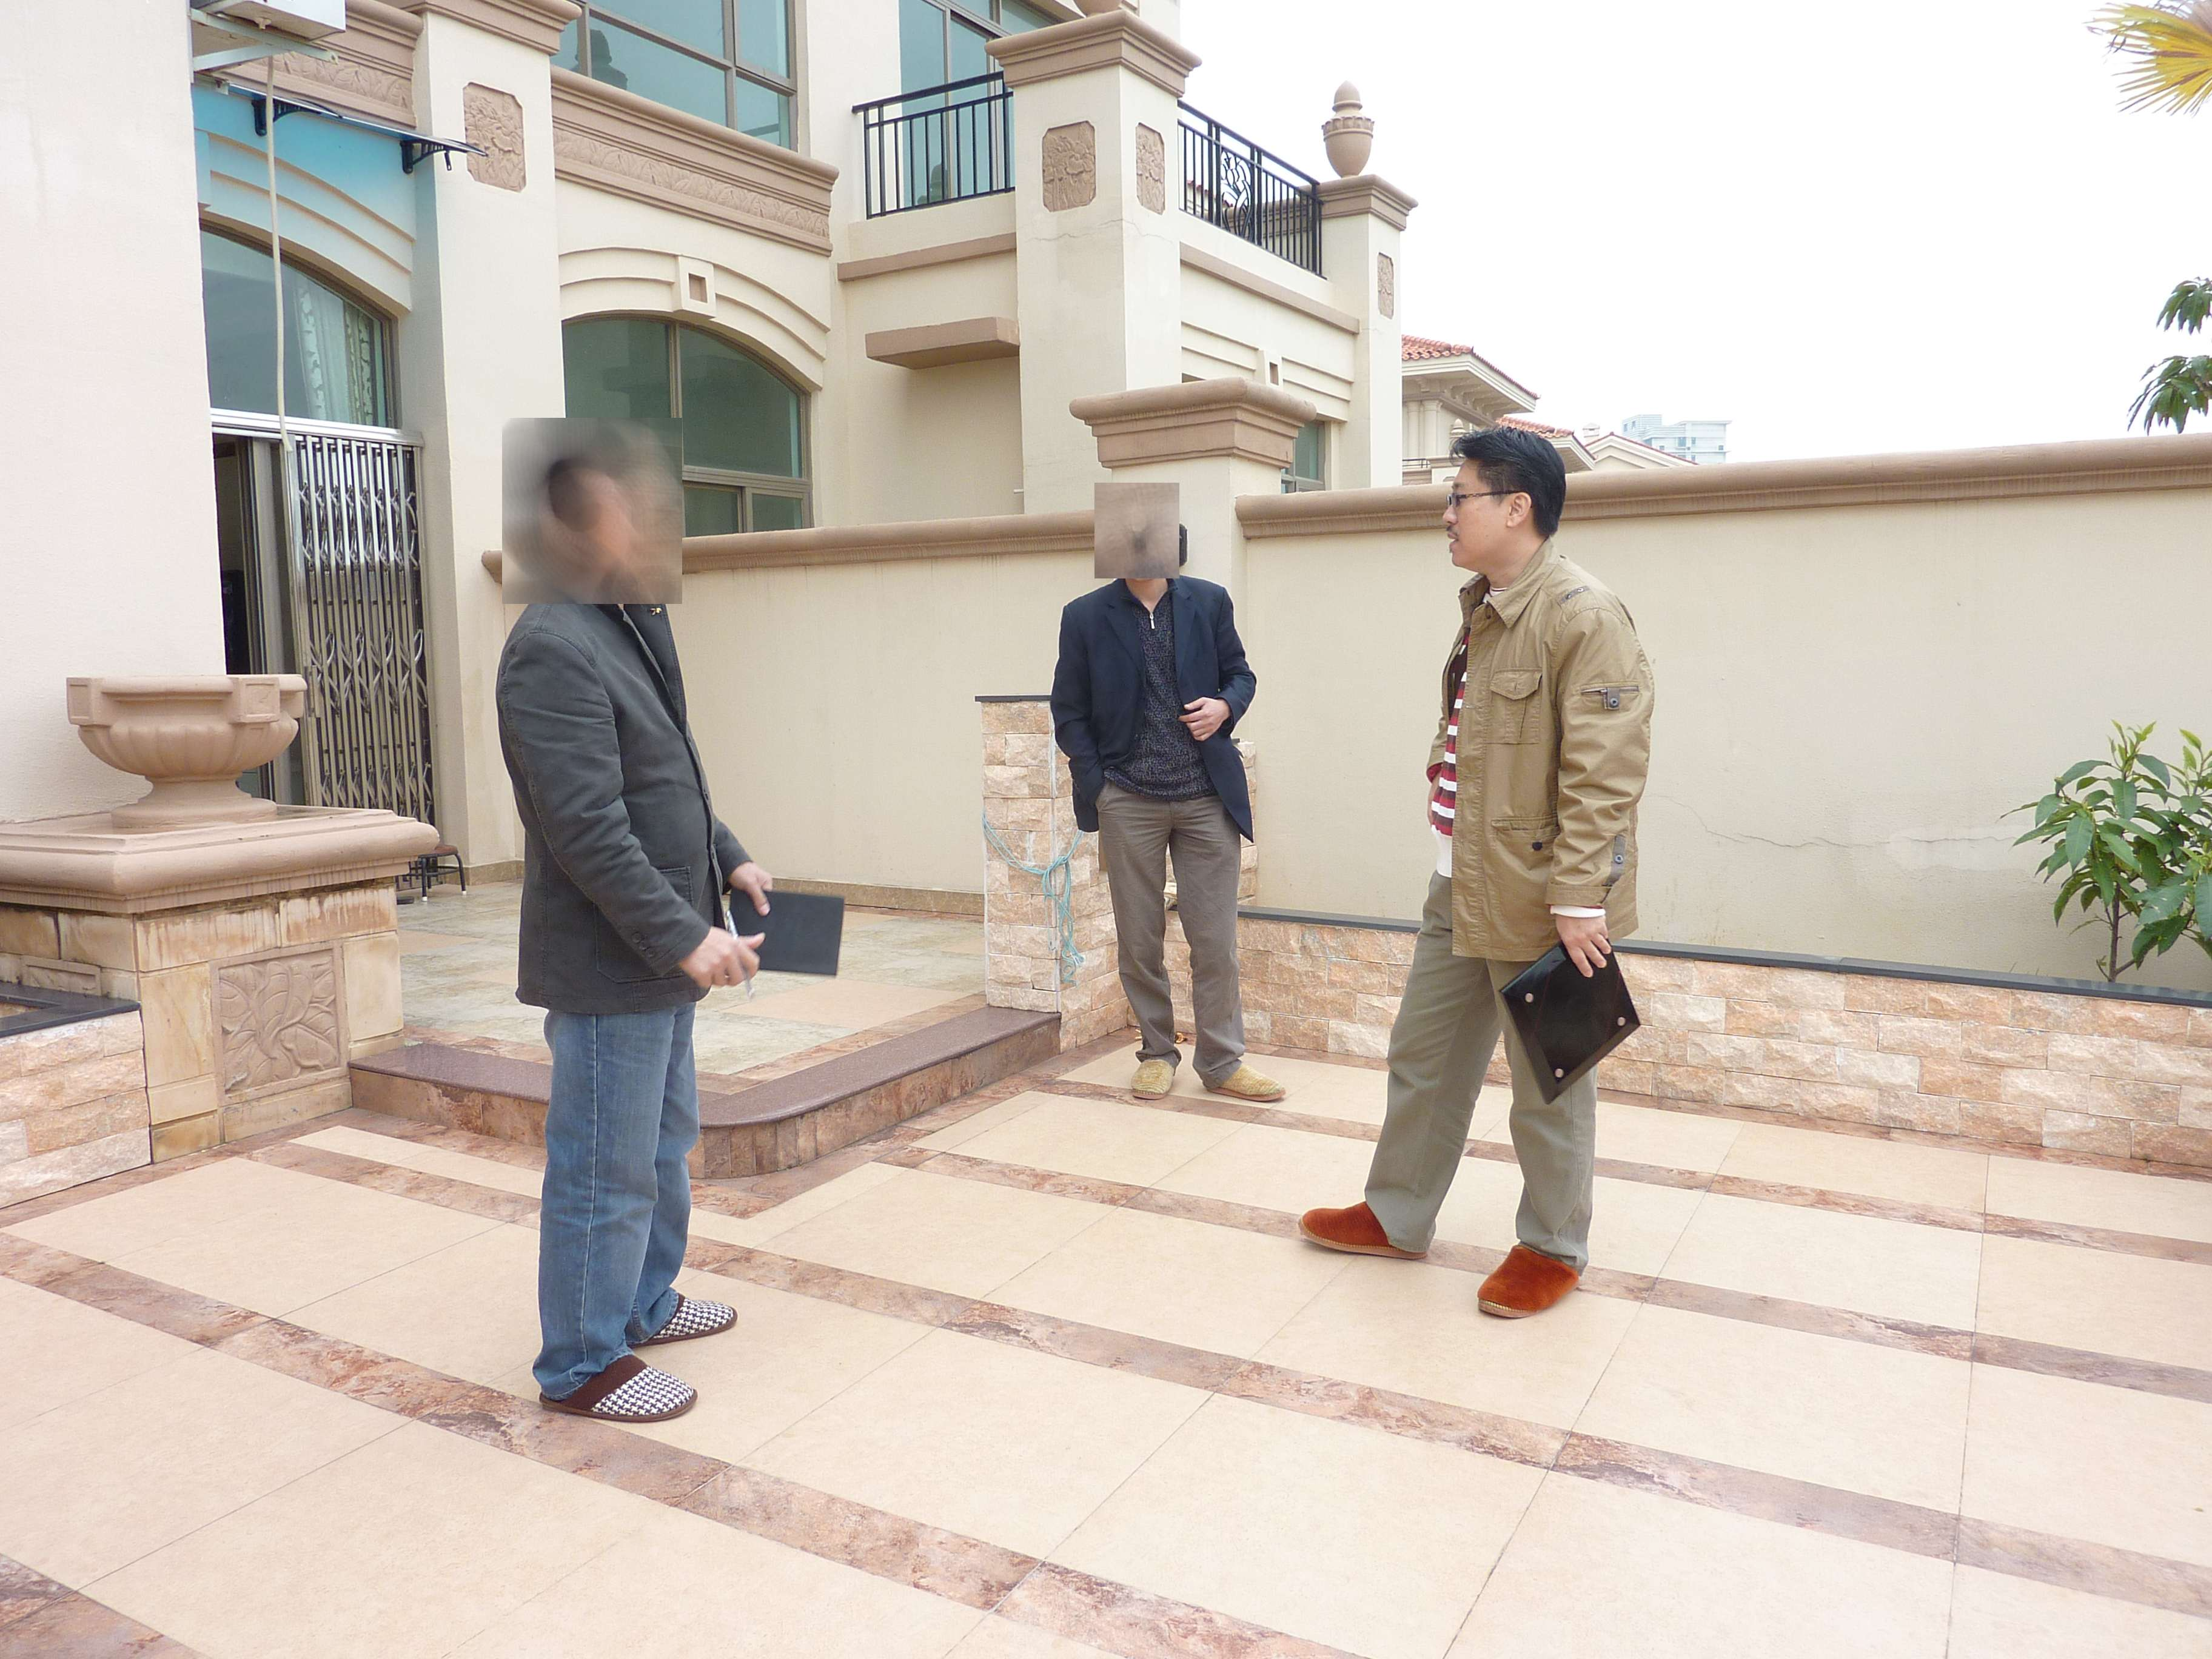 Master Soon In Guangdong, China 孙老师诊断风水 一针见血